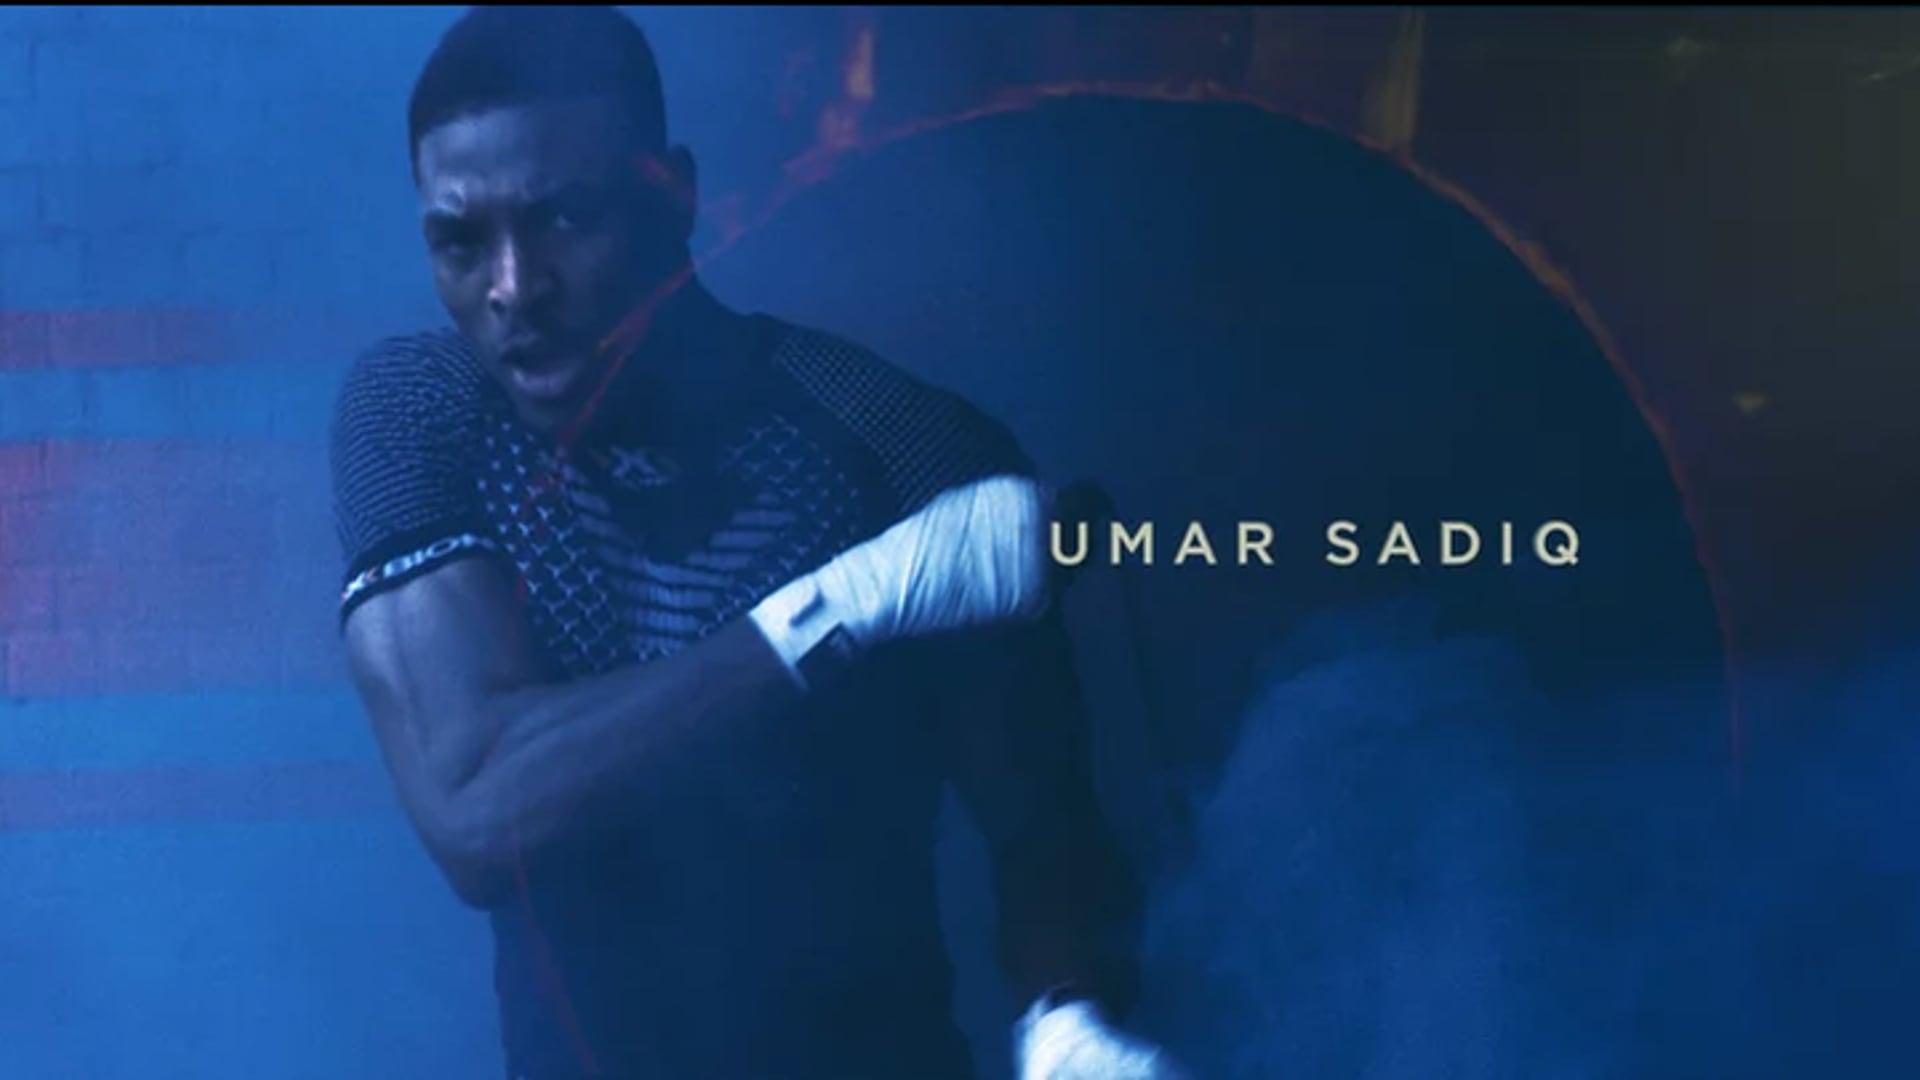 Introducing Umar Sadiq (Alt)